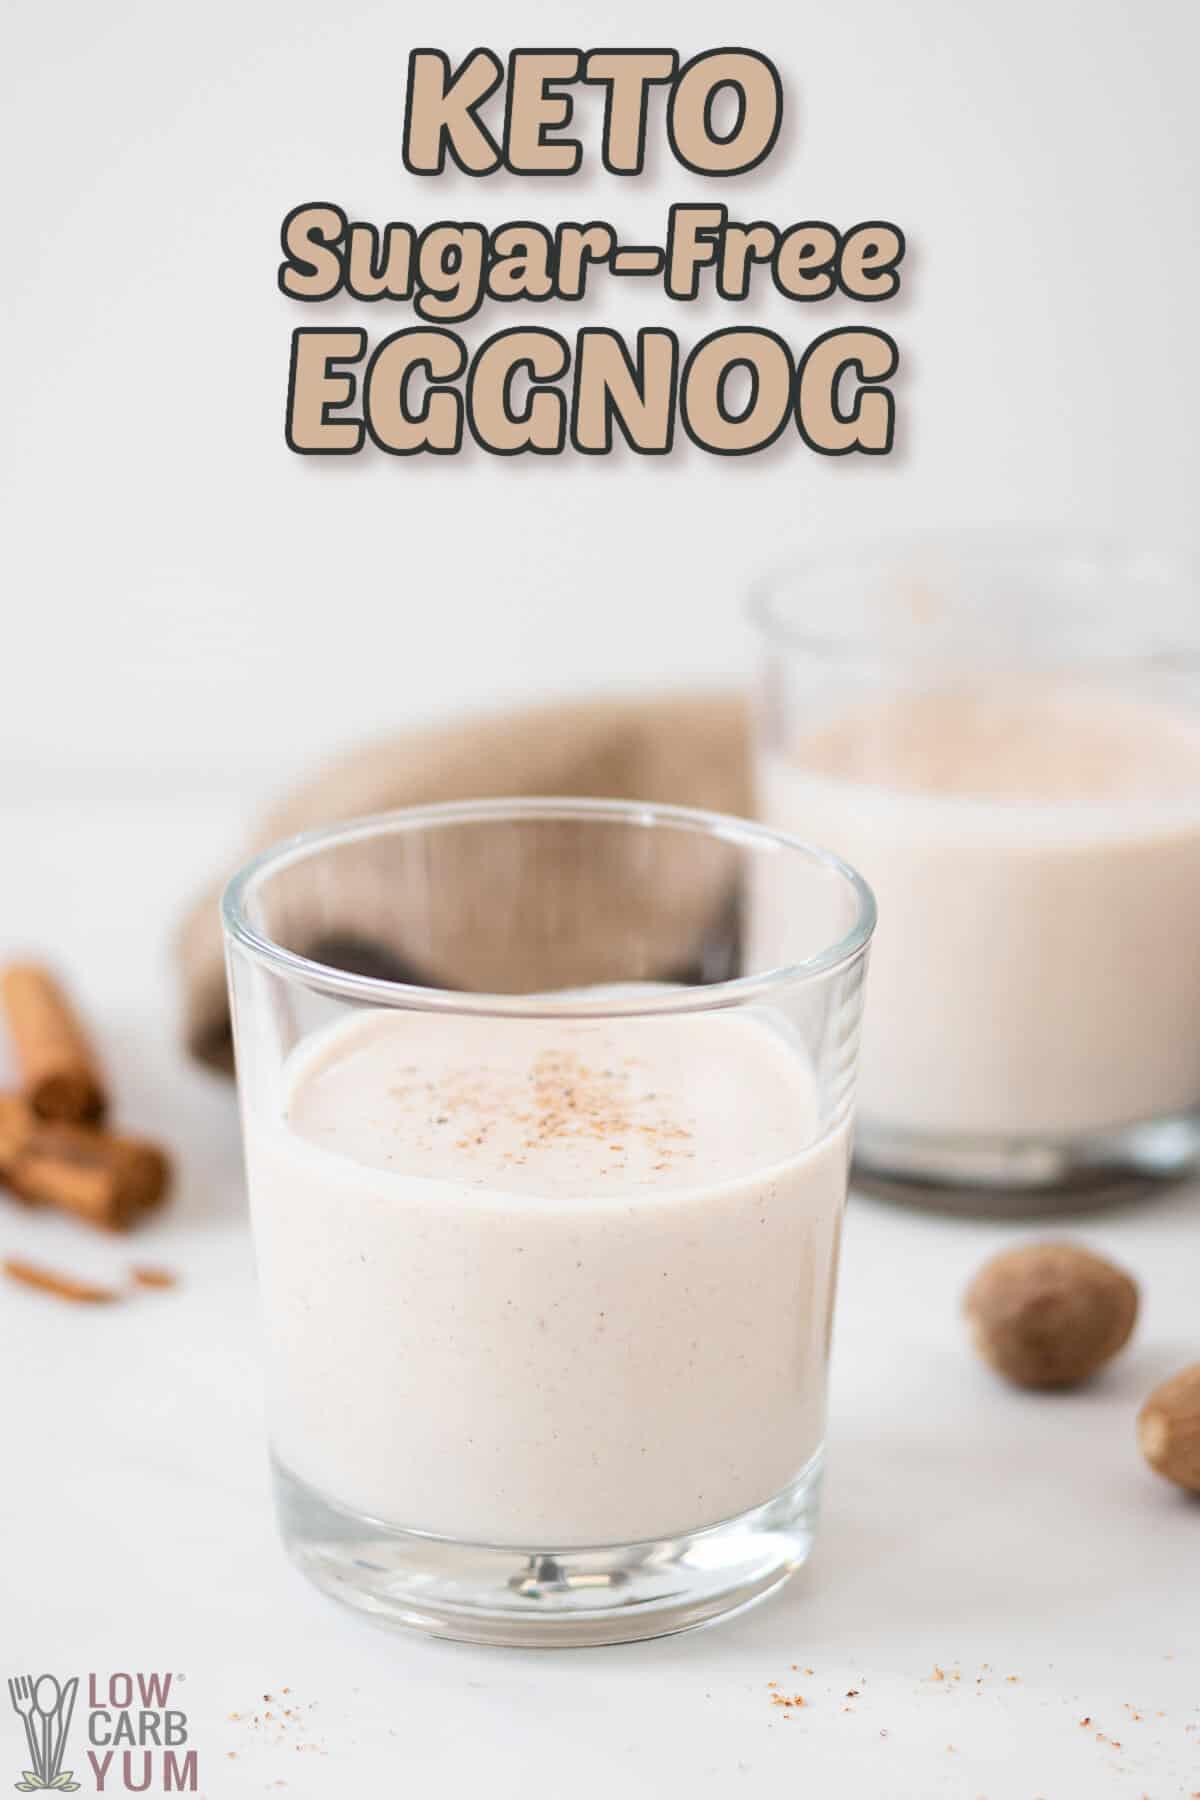 keto sugar free eggnog cover image